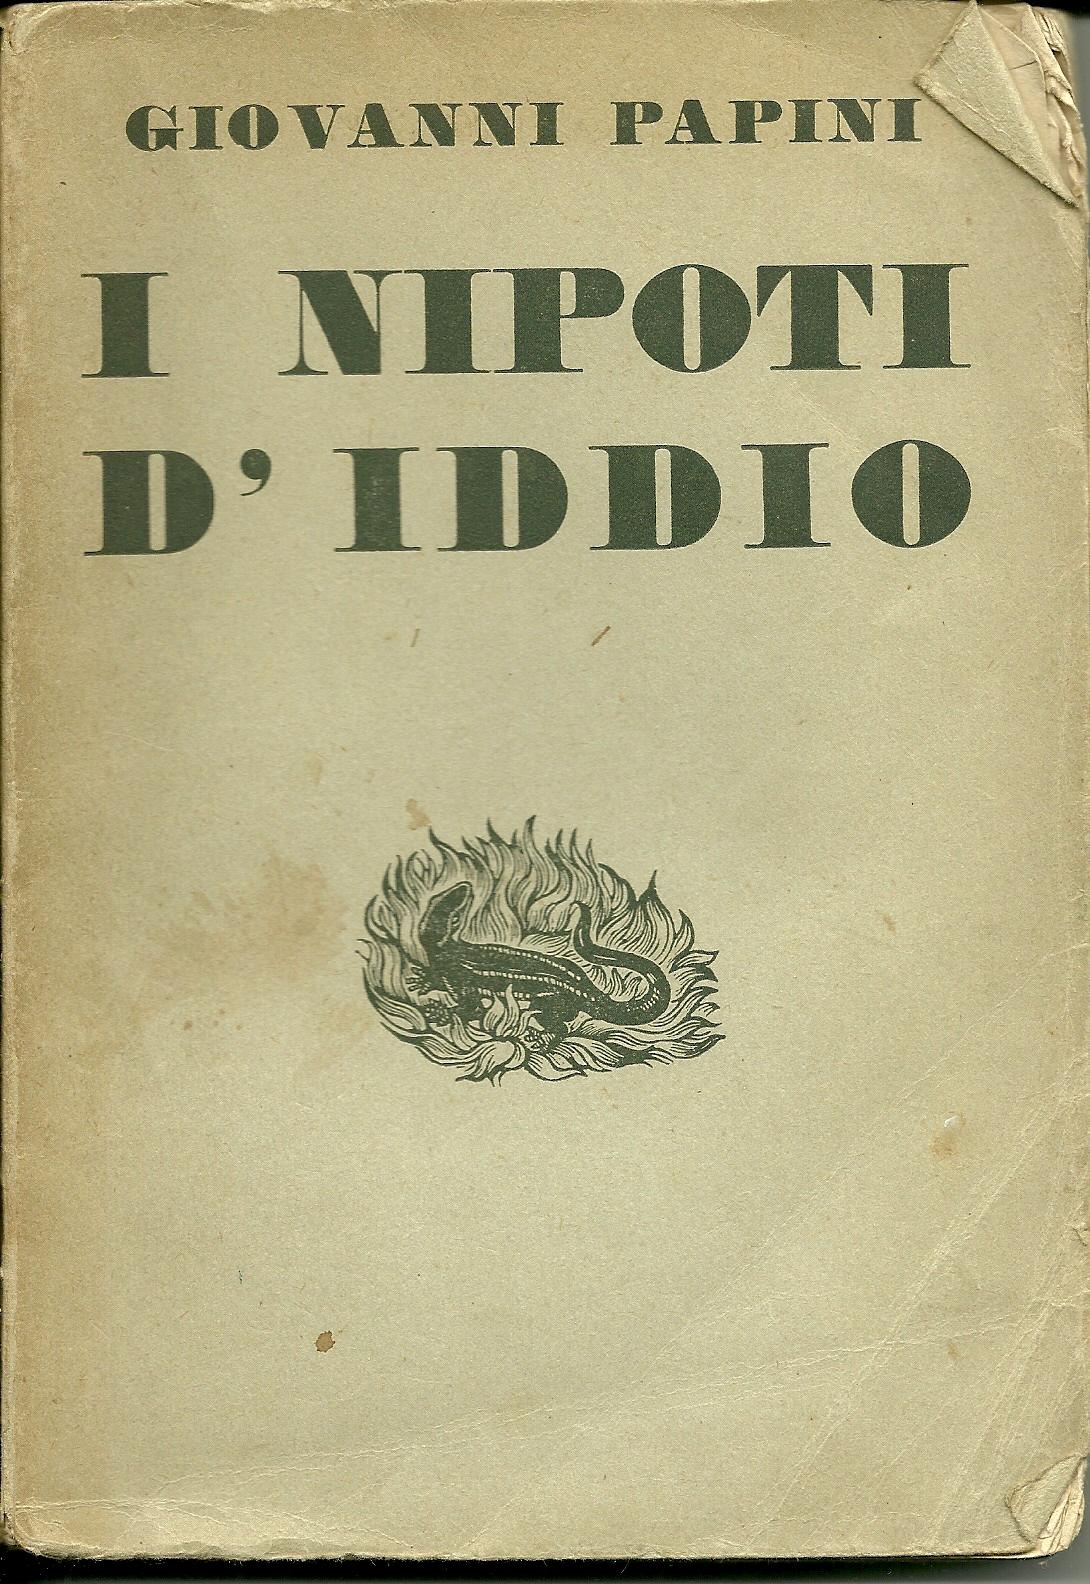 I nipoti d'Iddio (1903 - 1931)